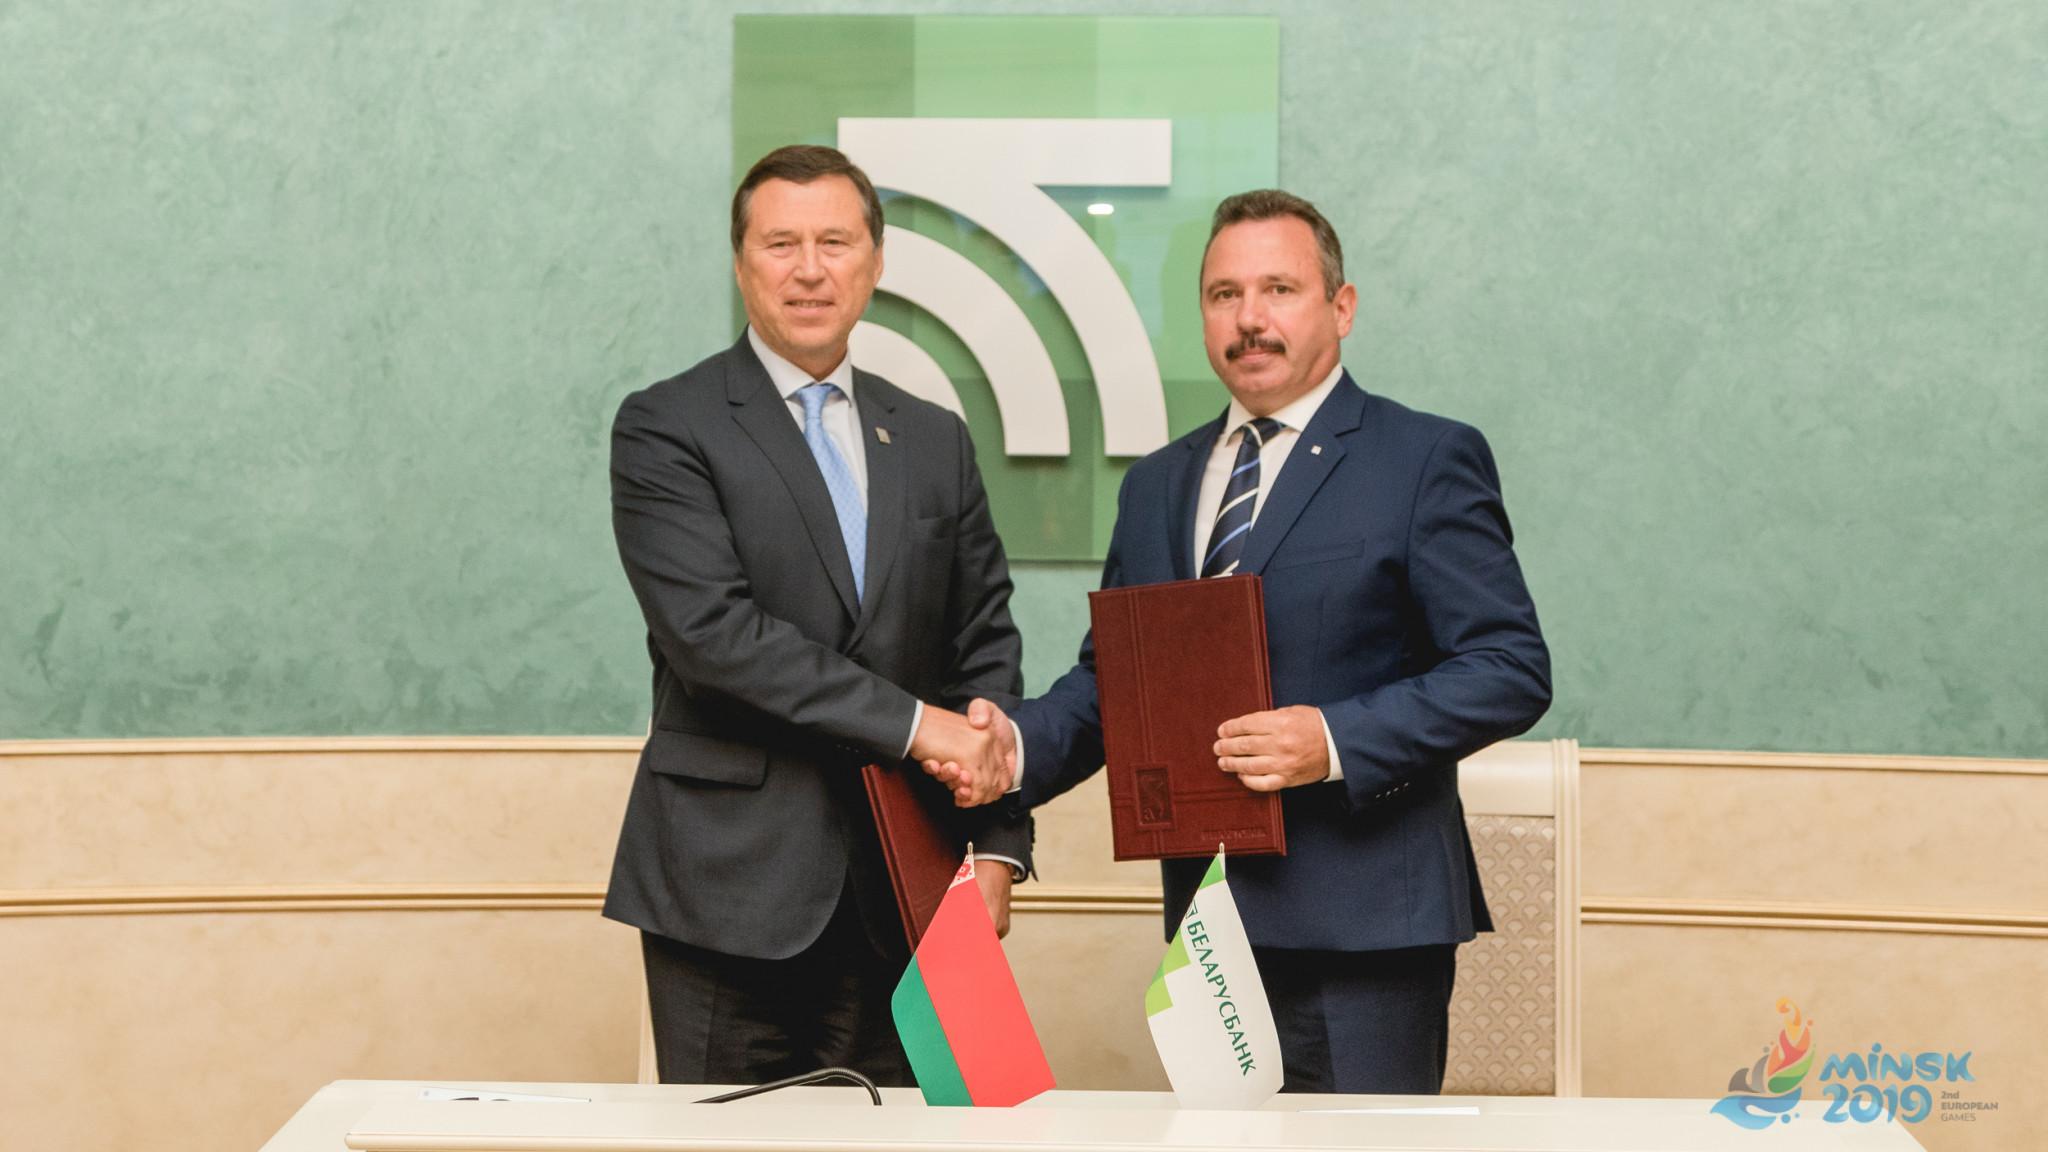 Minsk 2019 announce partnership with Belarusbank